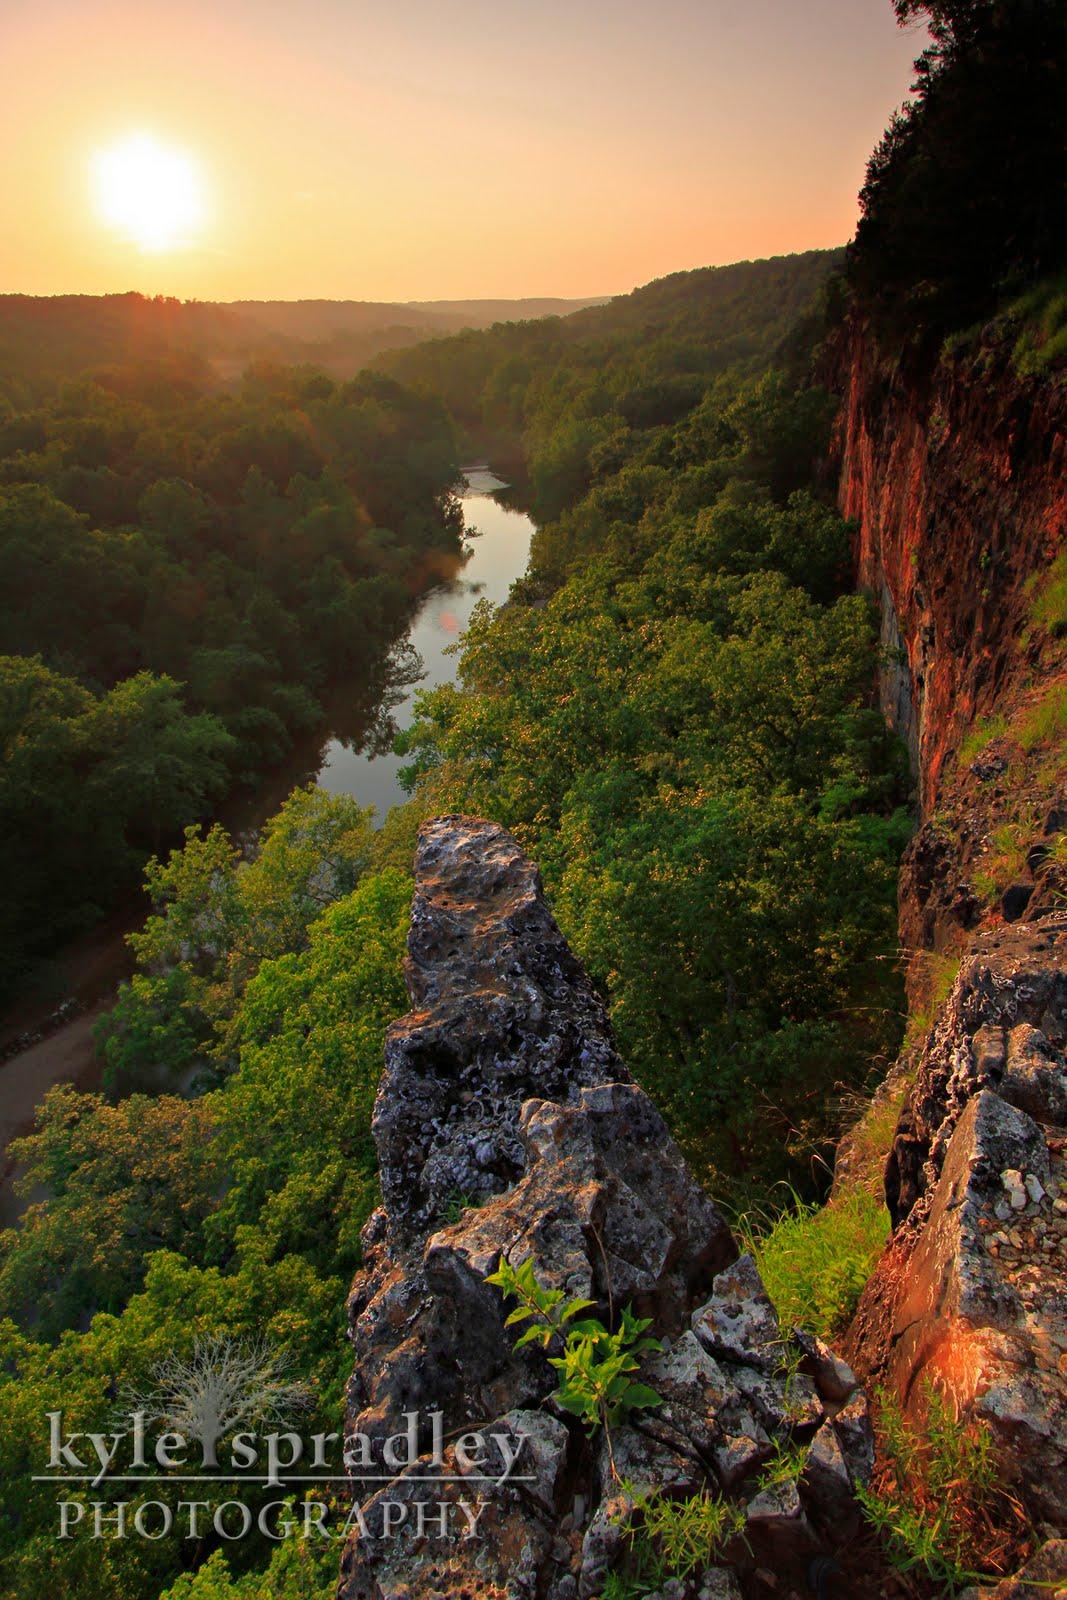 Kyle Spradley Photography Blog Red Bluff Recreation Area